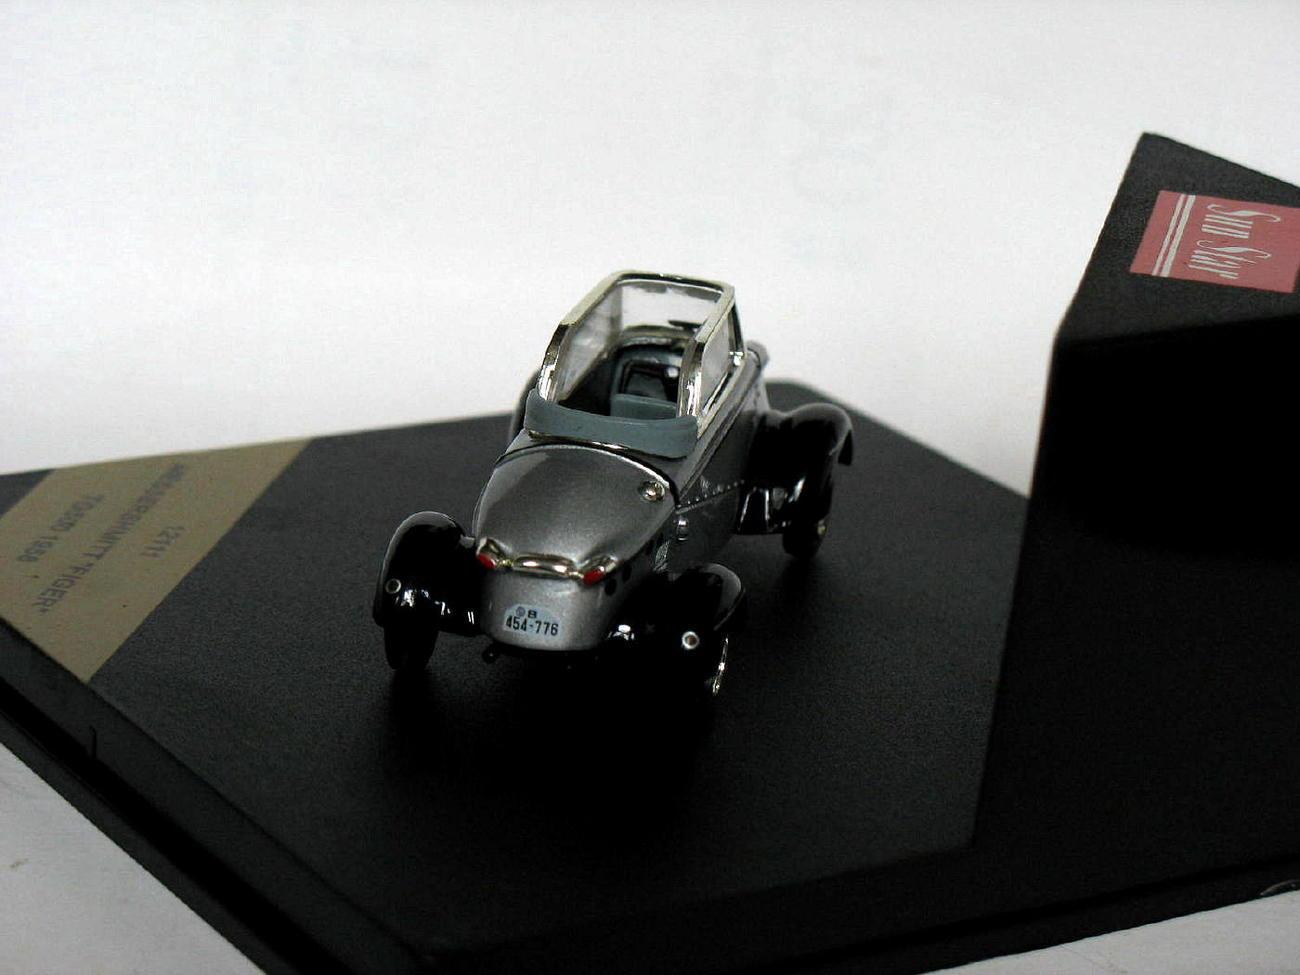 Messershmitt Figer TG500 1958 silver 1/43 die cast model car (Rare)